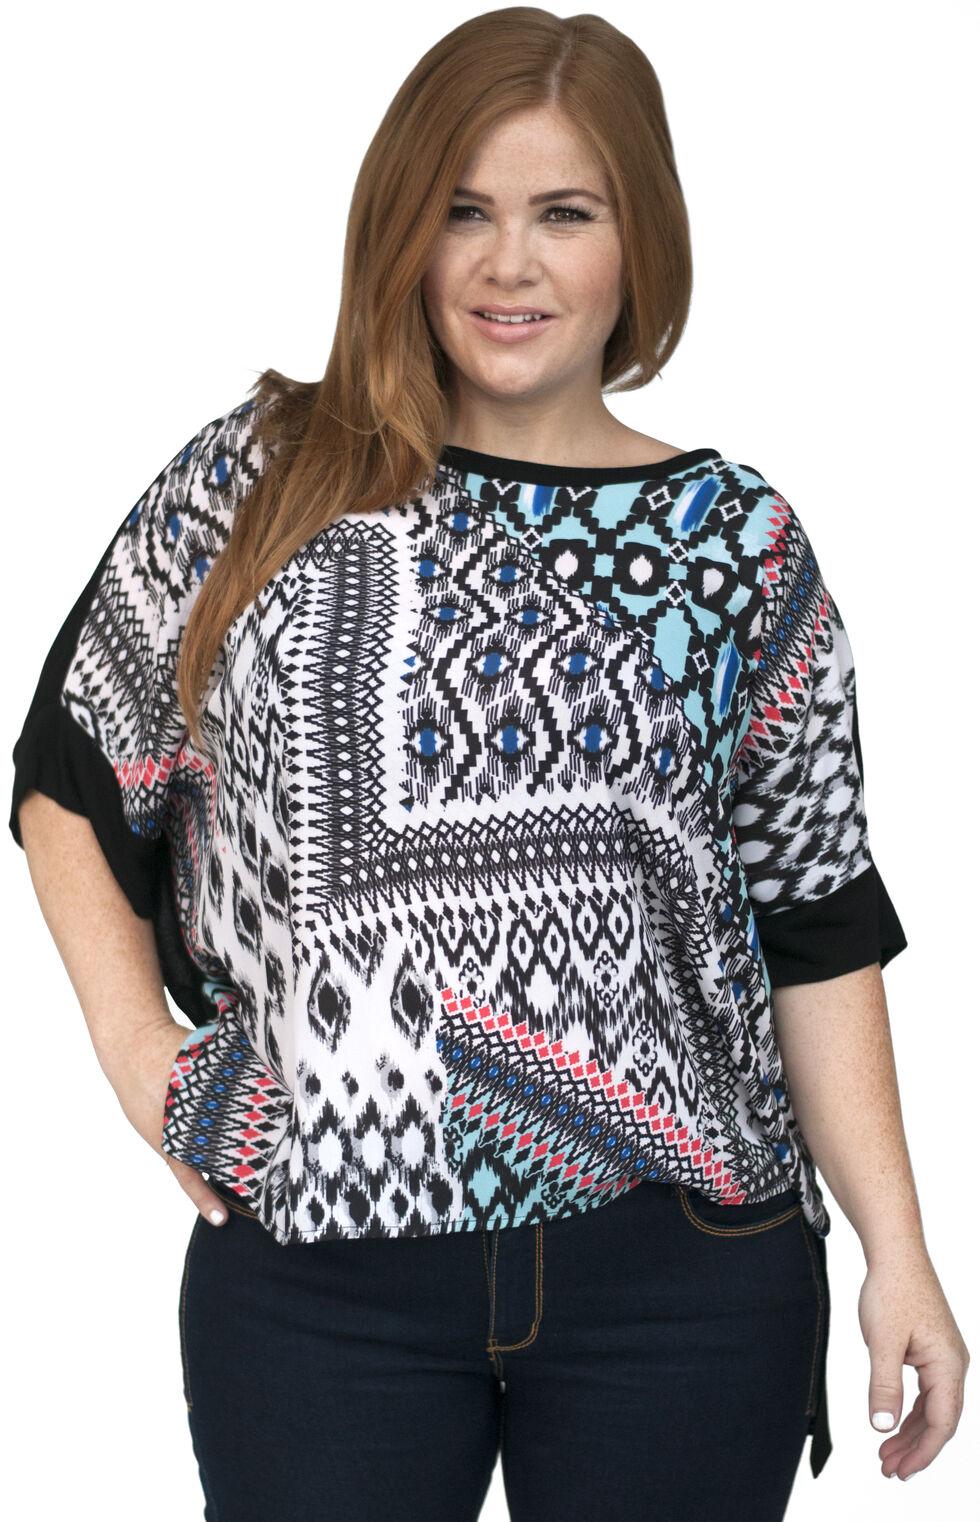 Lawman Women's Printed Chiffon Tunic - Plus Size, Aqua, hi-res